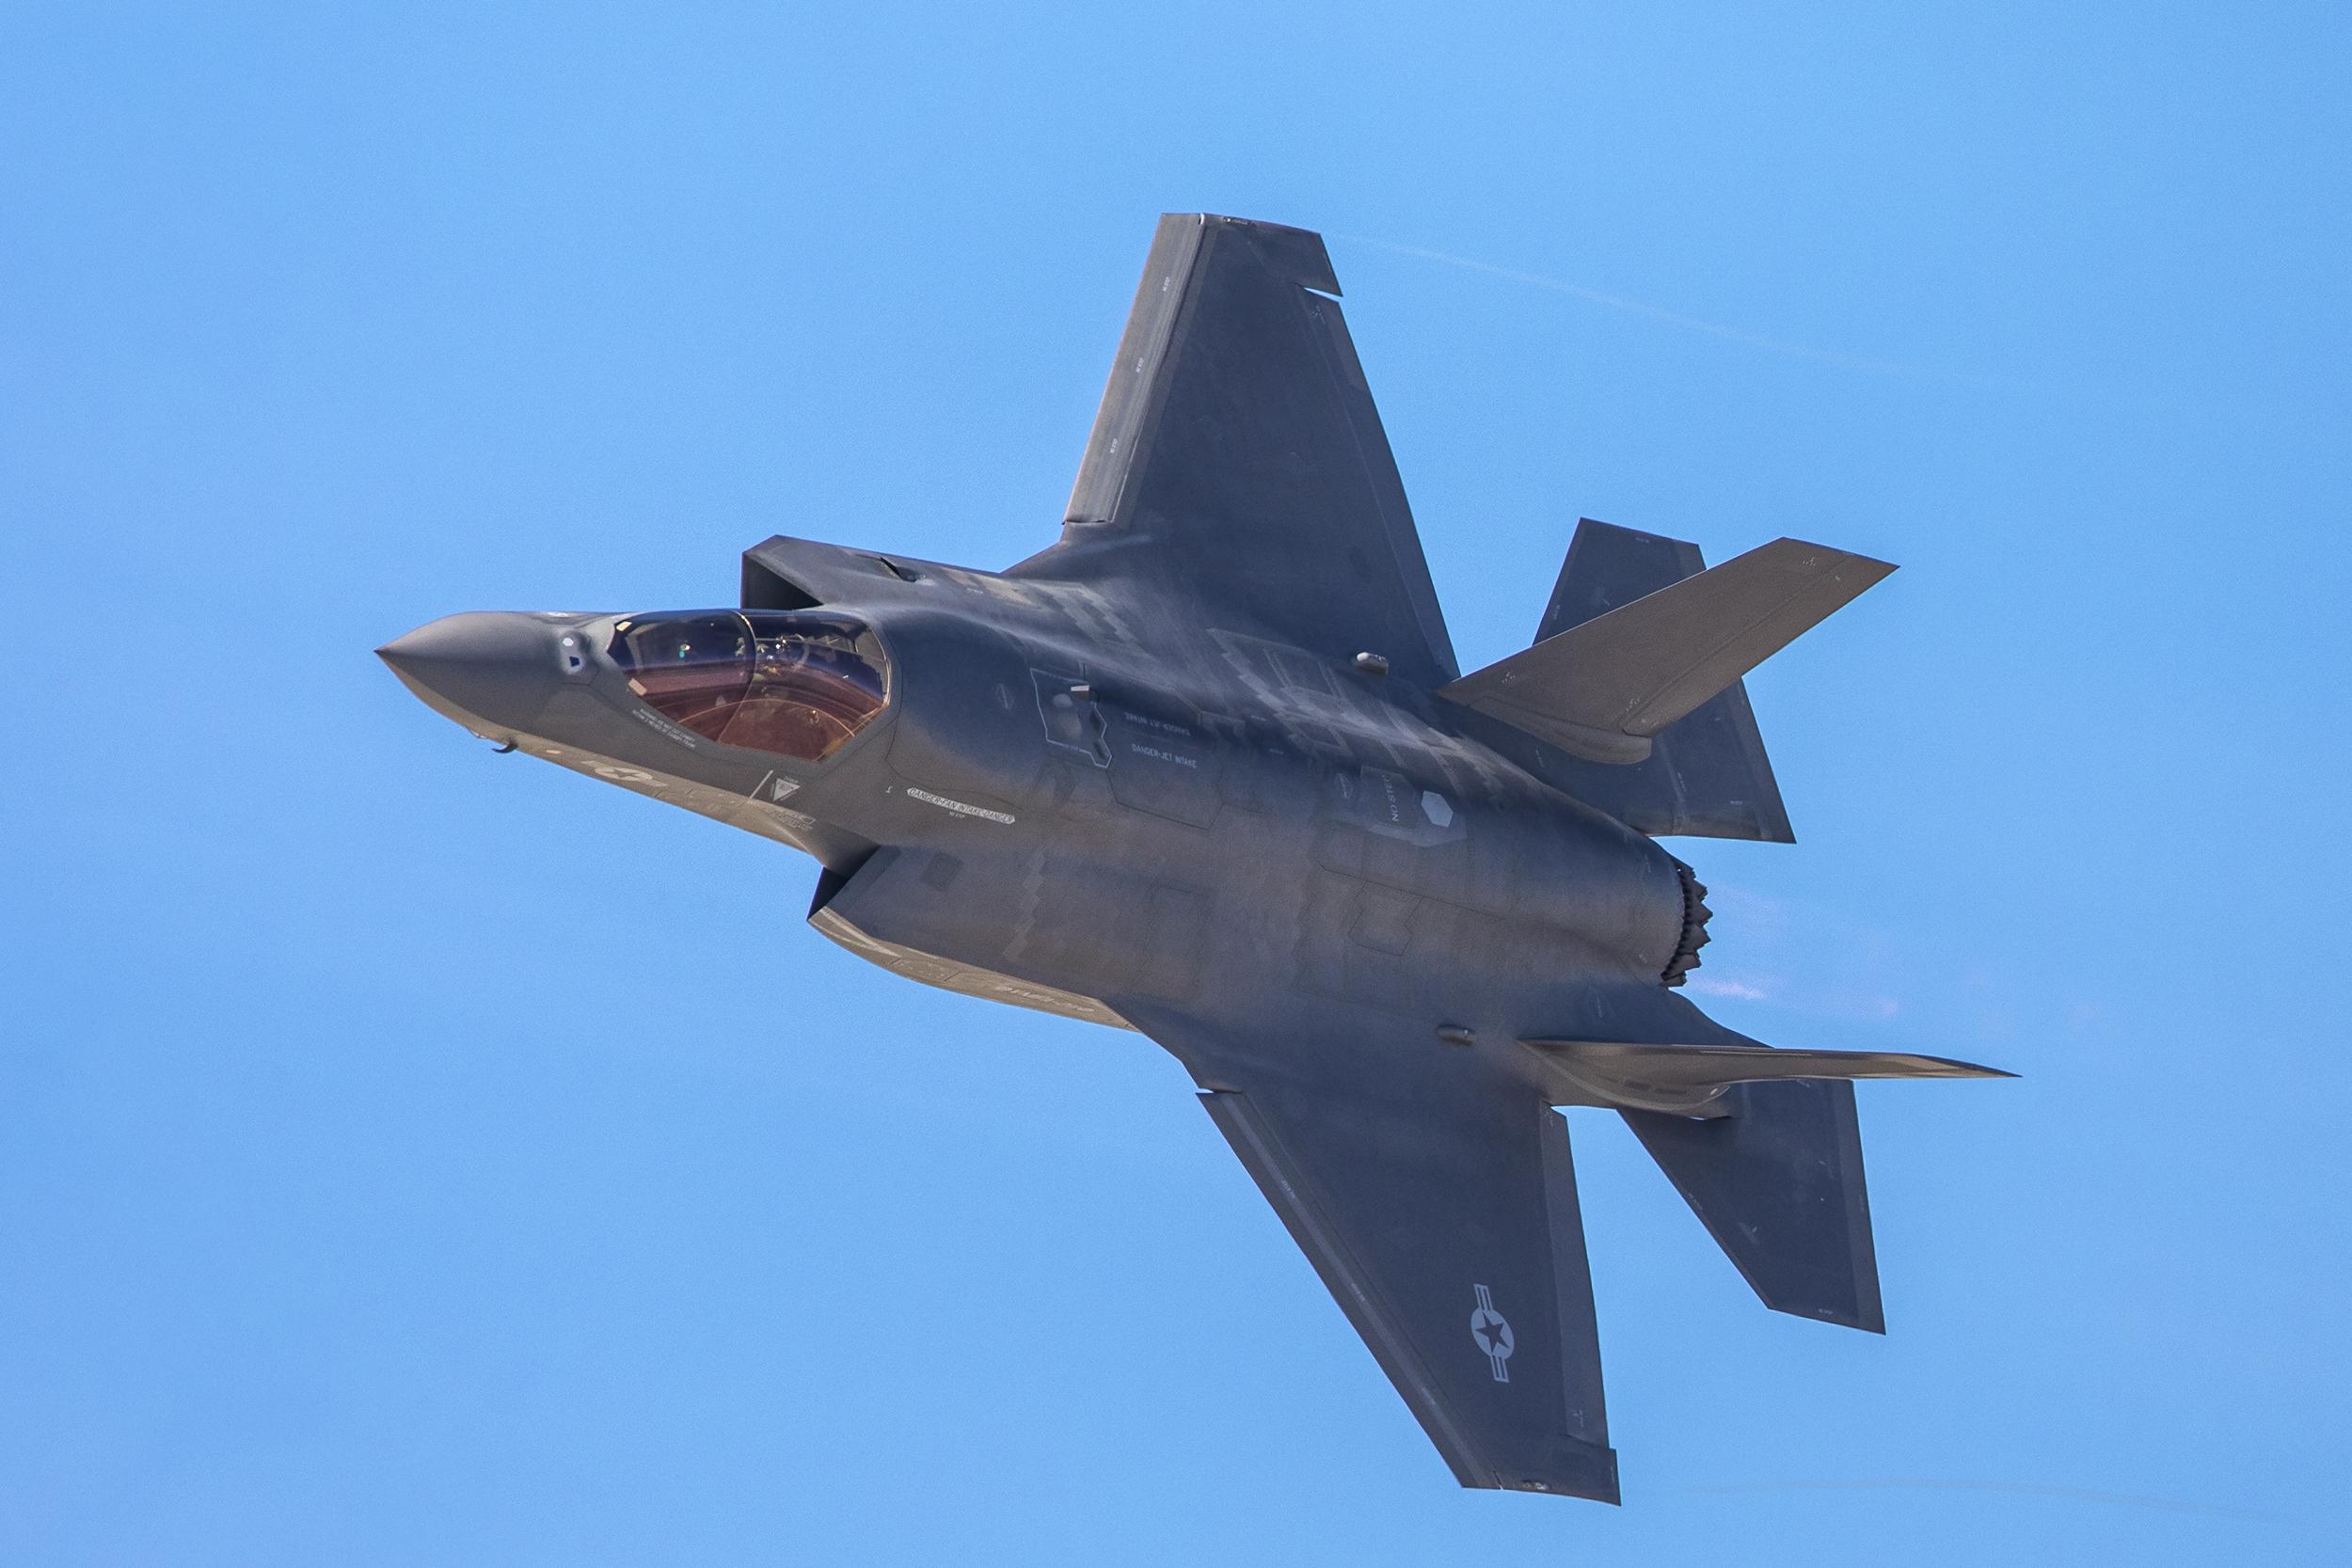 F-35 Lightning II fighter jet